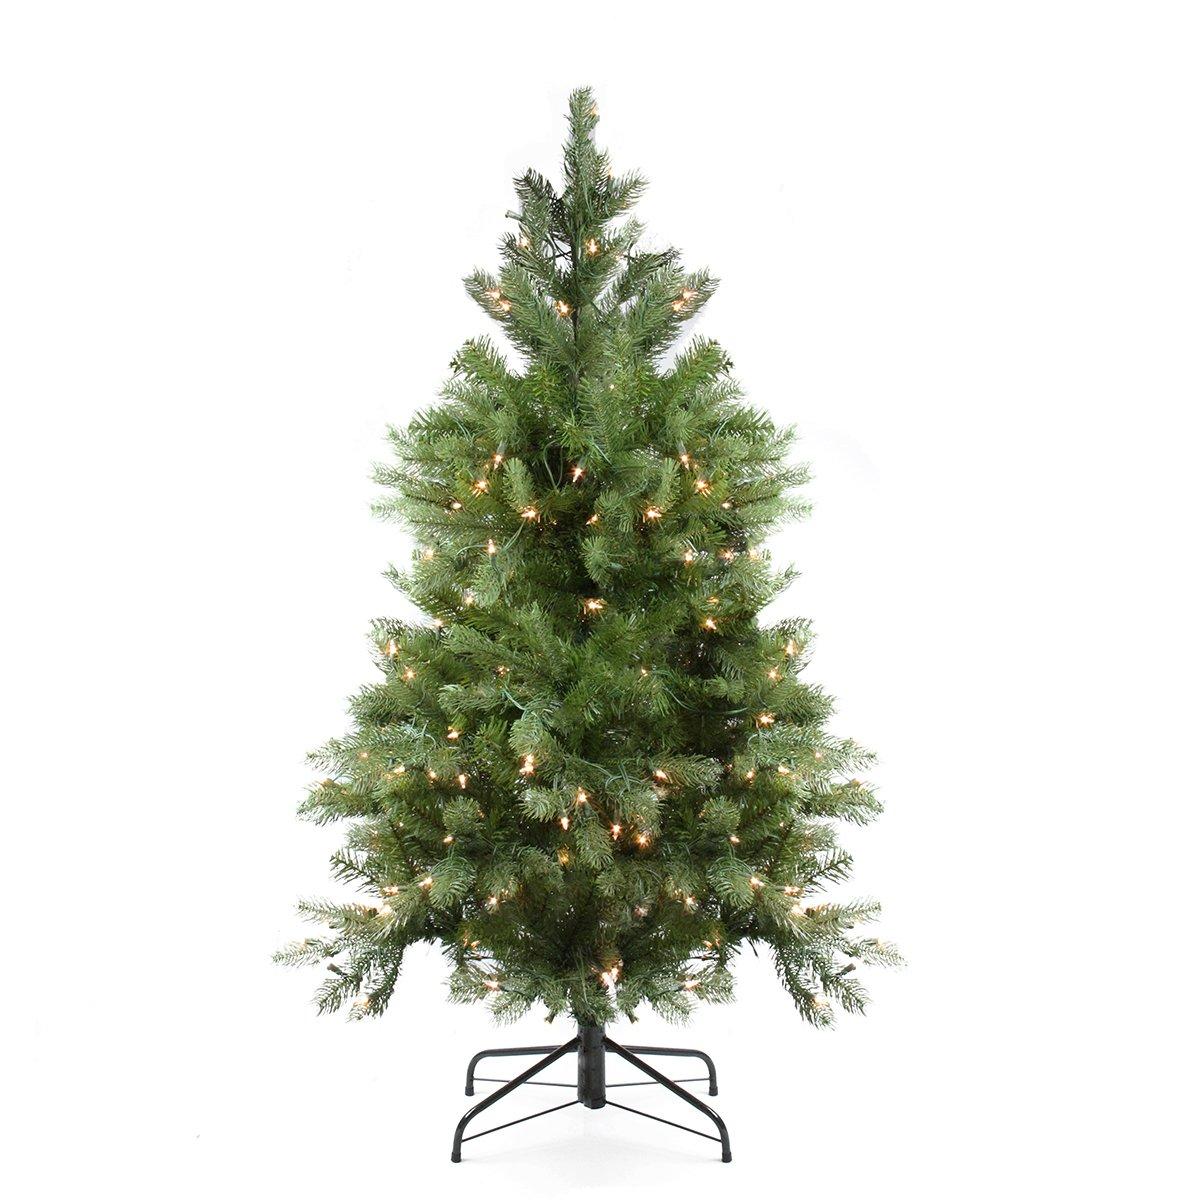 Noble Fir Christmas Trees: Amazon.com